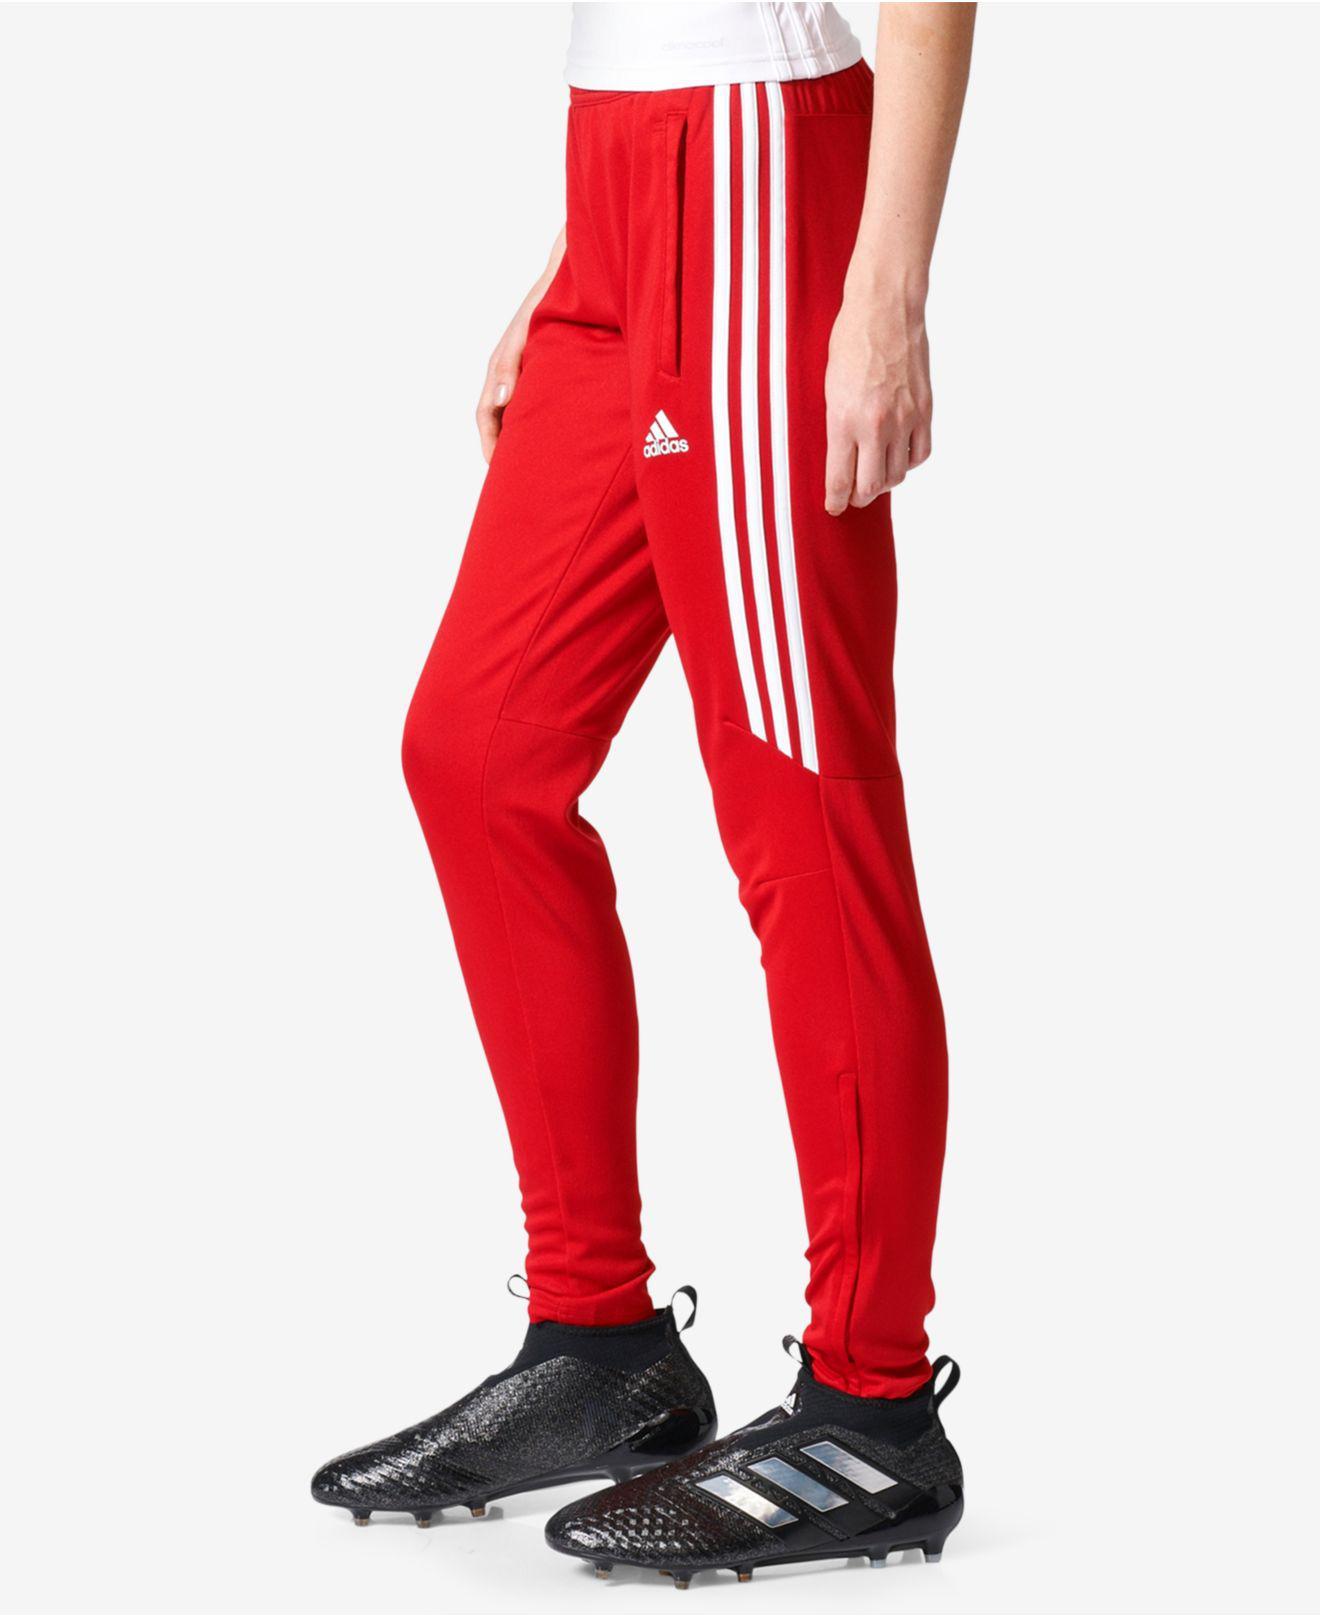 Tiro Climacool Soccer Pants